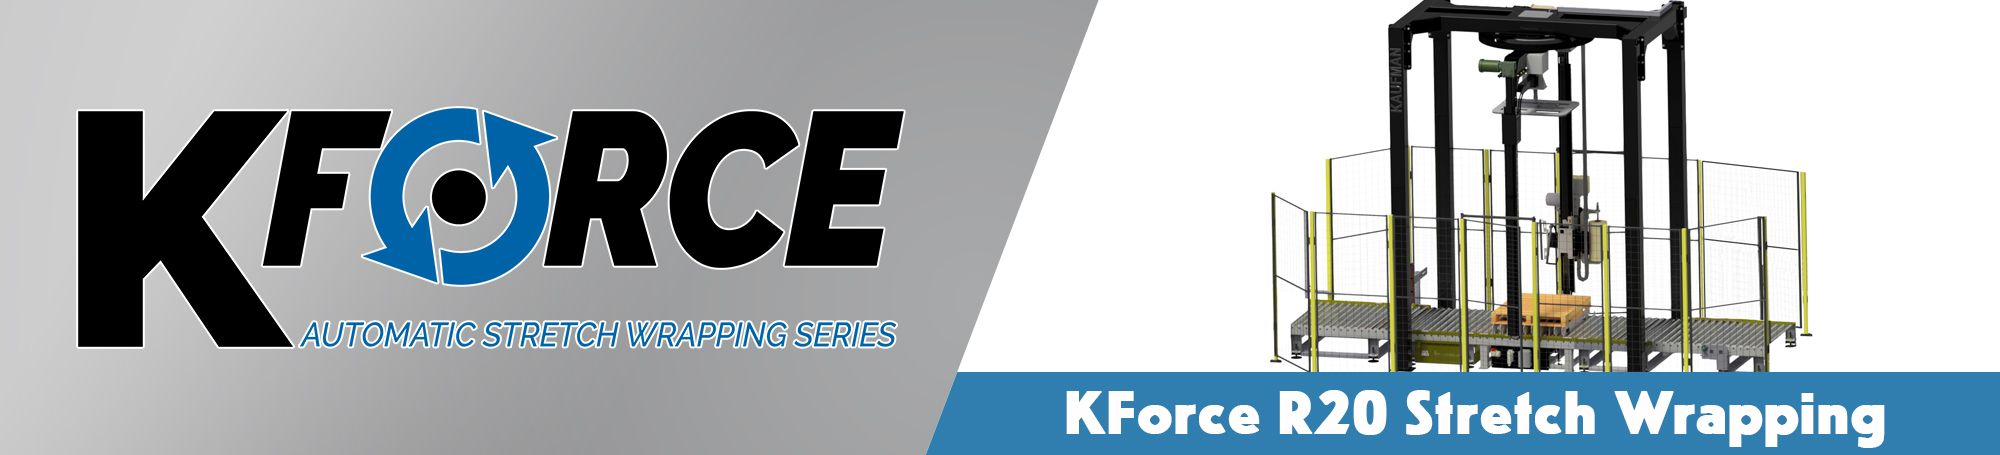 KForce R20 Wrapper.jpg